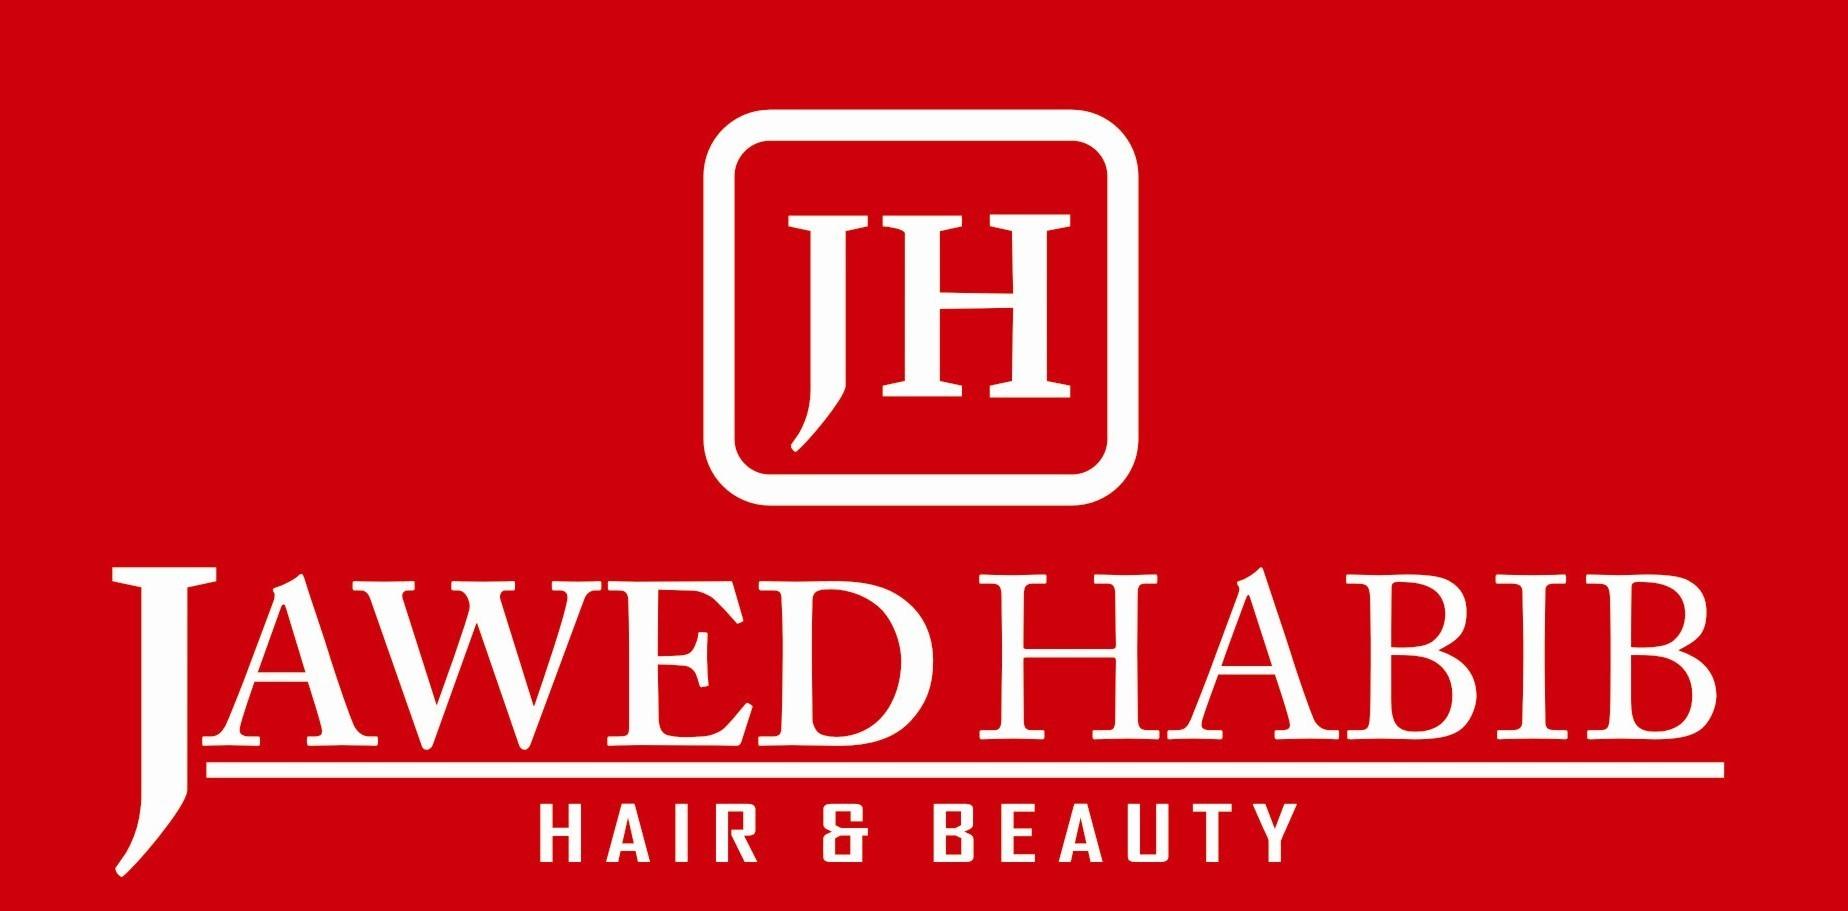 Jawed Habib Hair & Beauty Salons - Court Road - Saharanpur Image